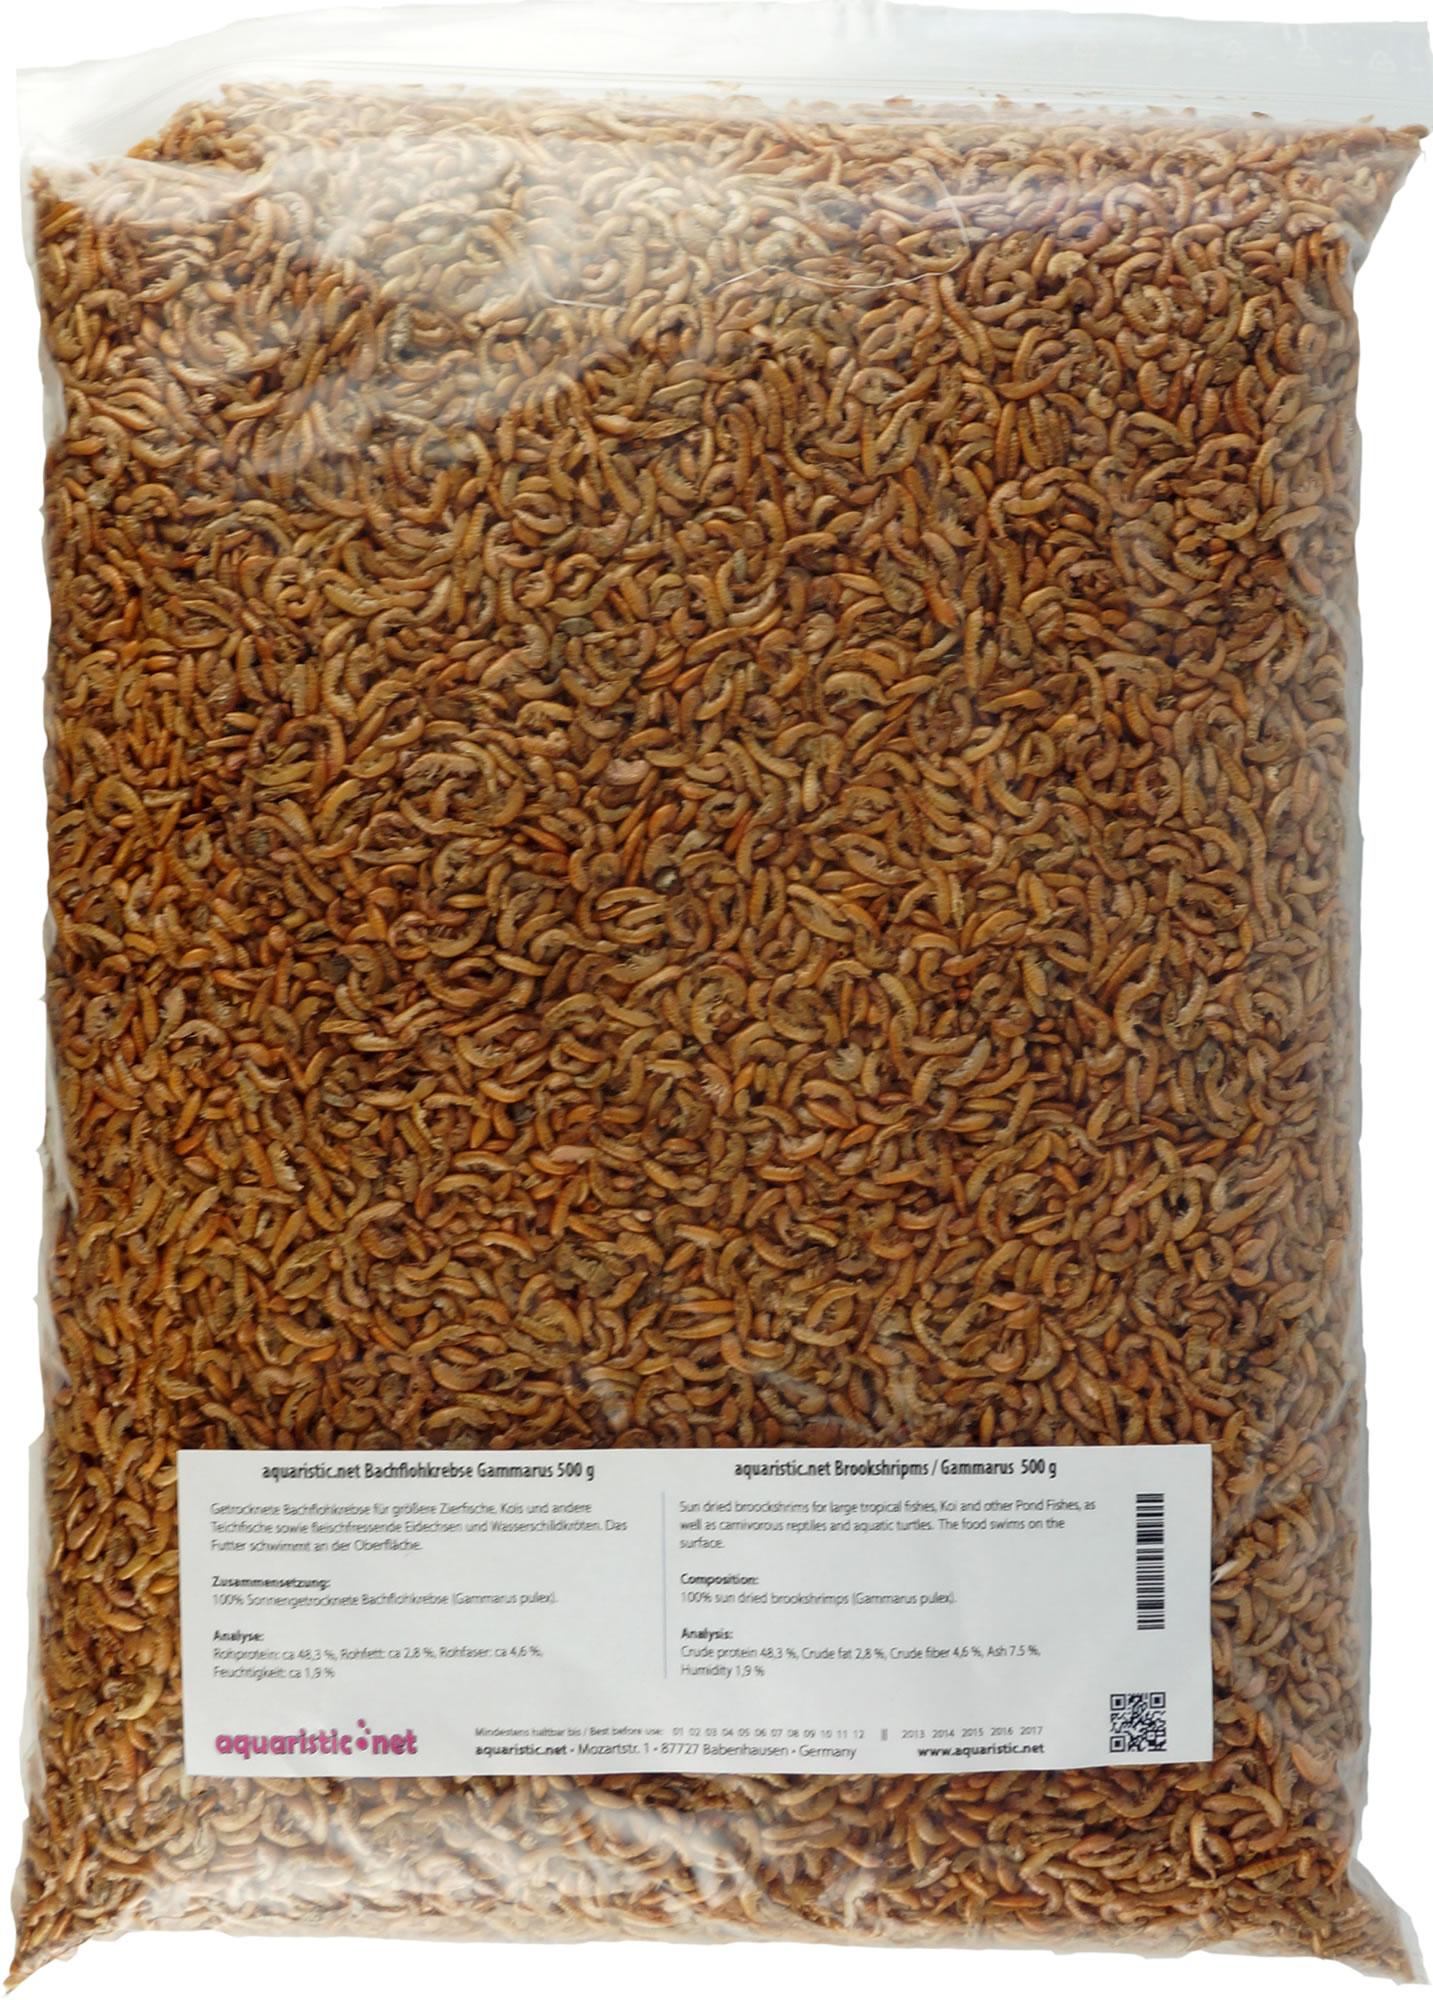 Bachflohkrebse / Gammarus getrocknet 500 g Beutel